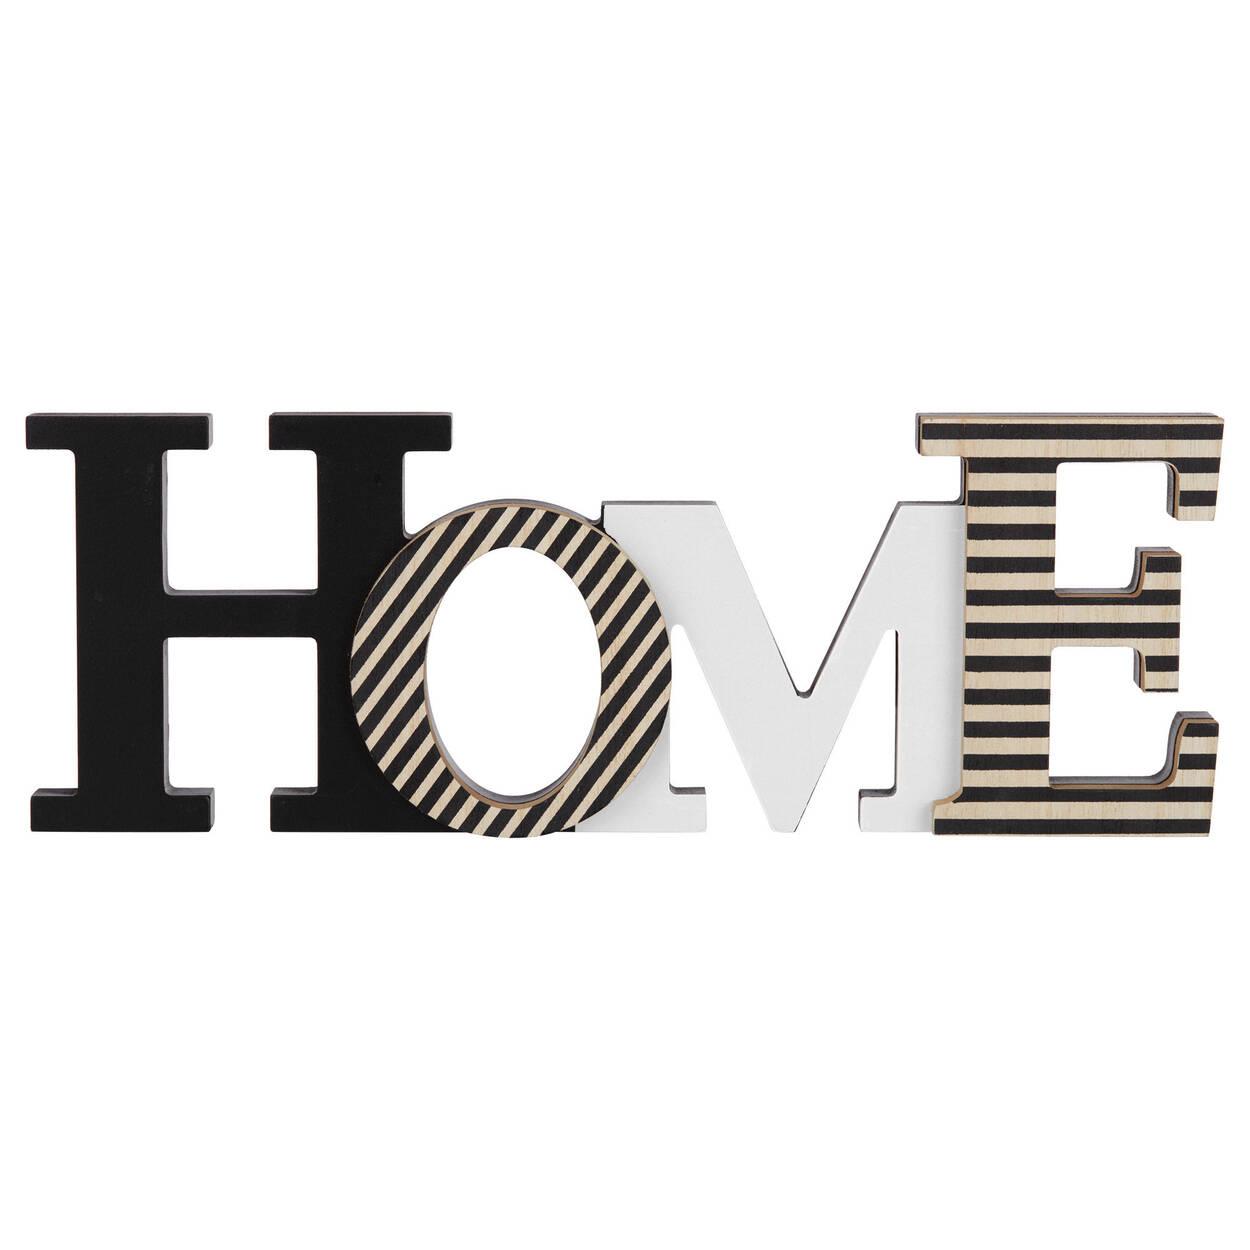 mot d coratif home. Black Bedroom Furniture Sets. Home Design Ideas